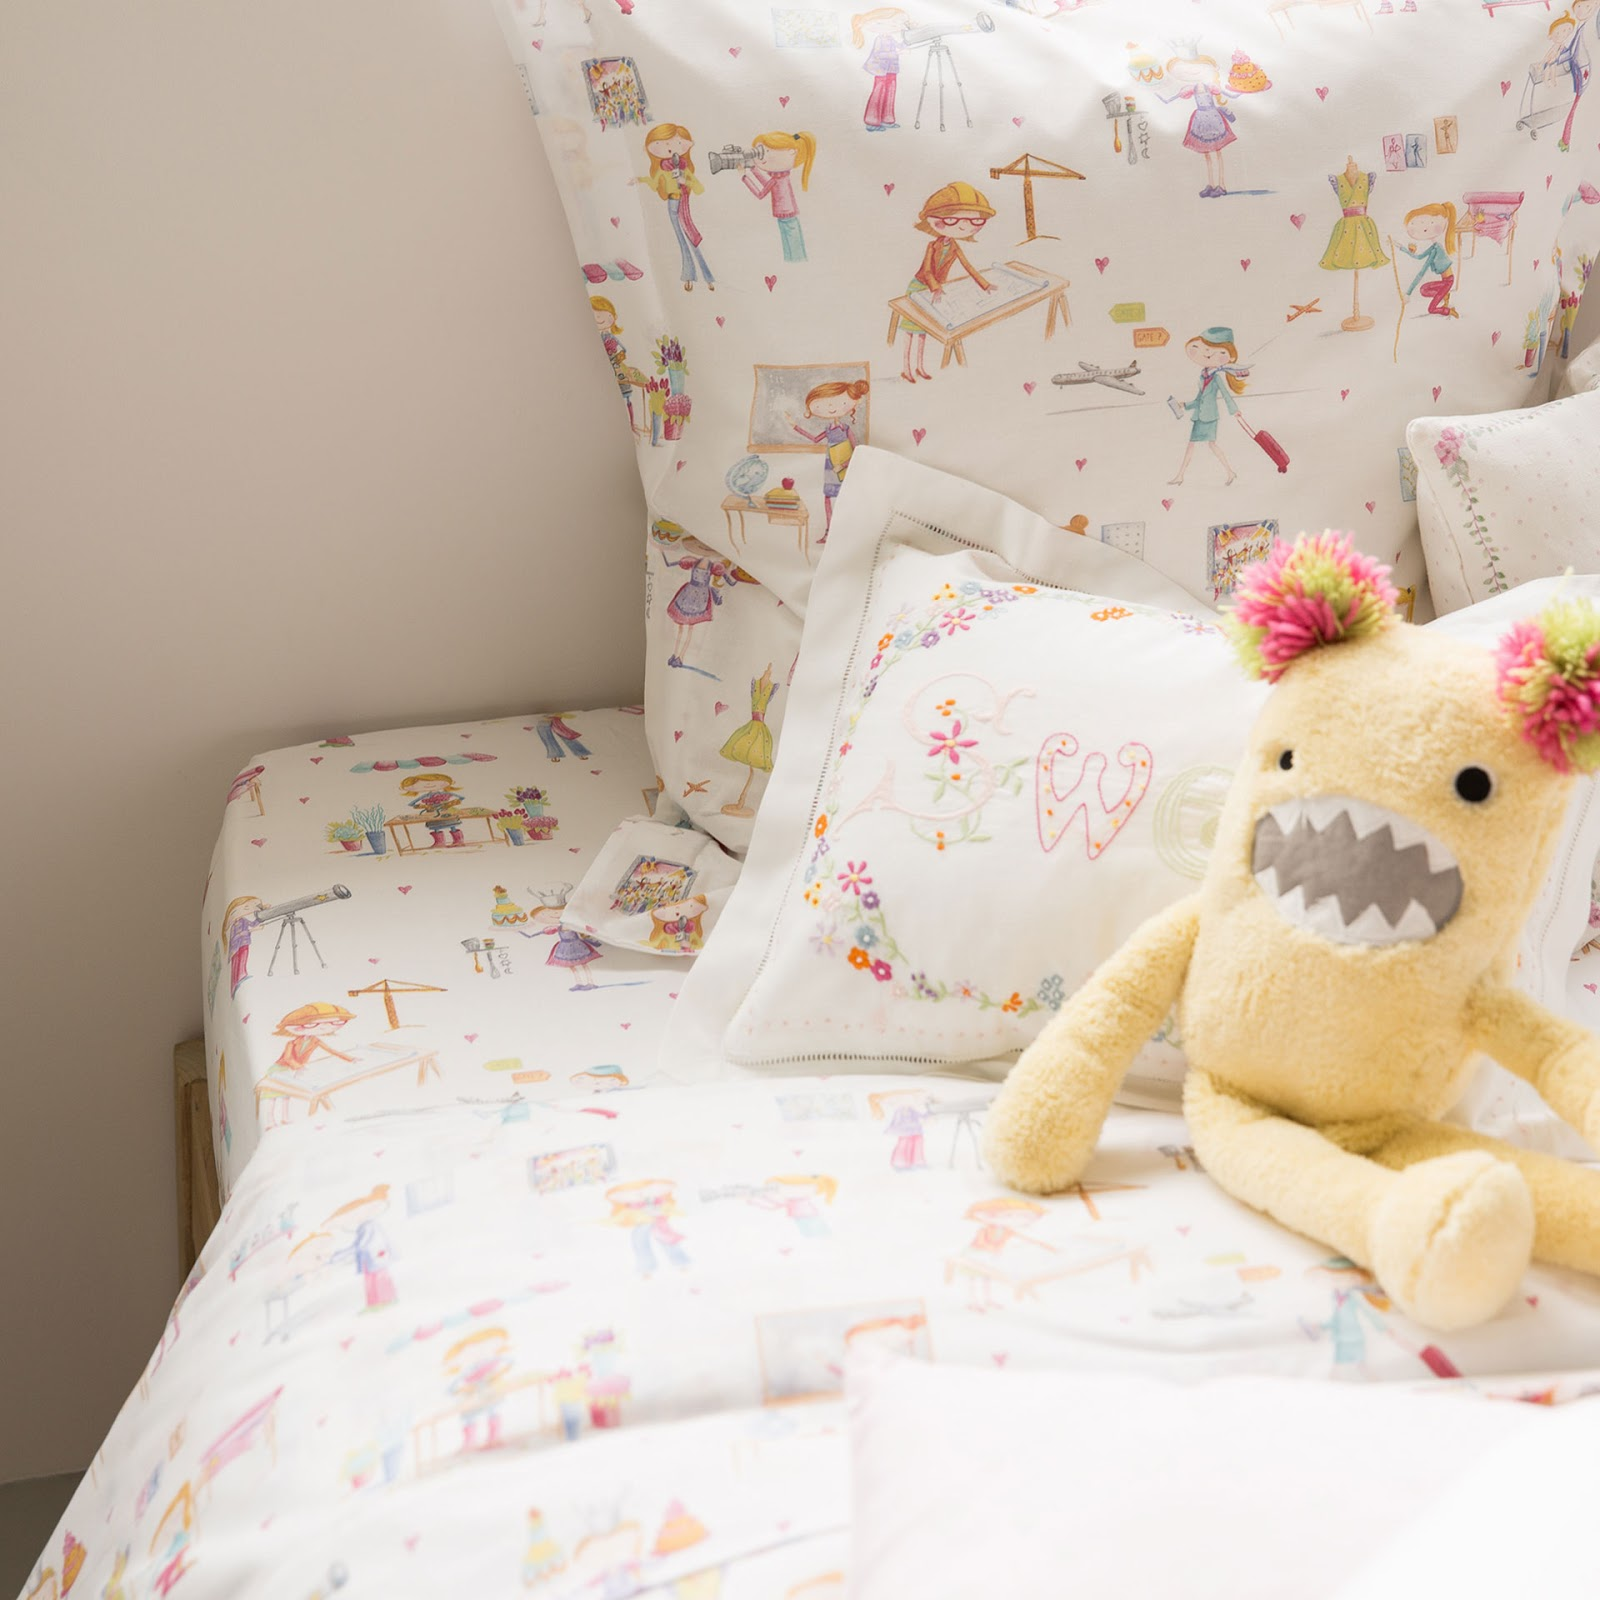 Blog da maggie a roupa de cama na zara home kids - Zara home kids cortinas ...